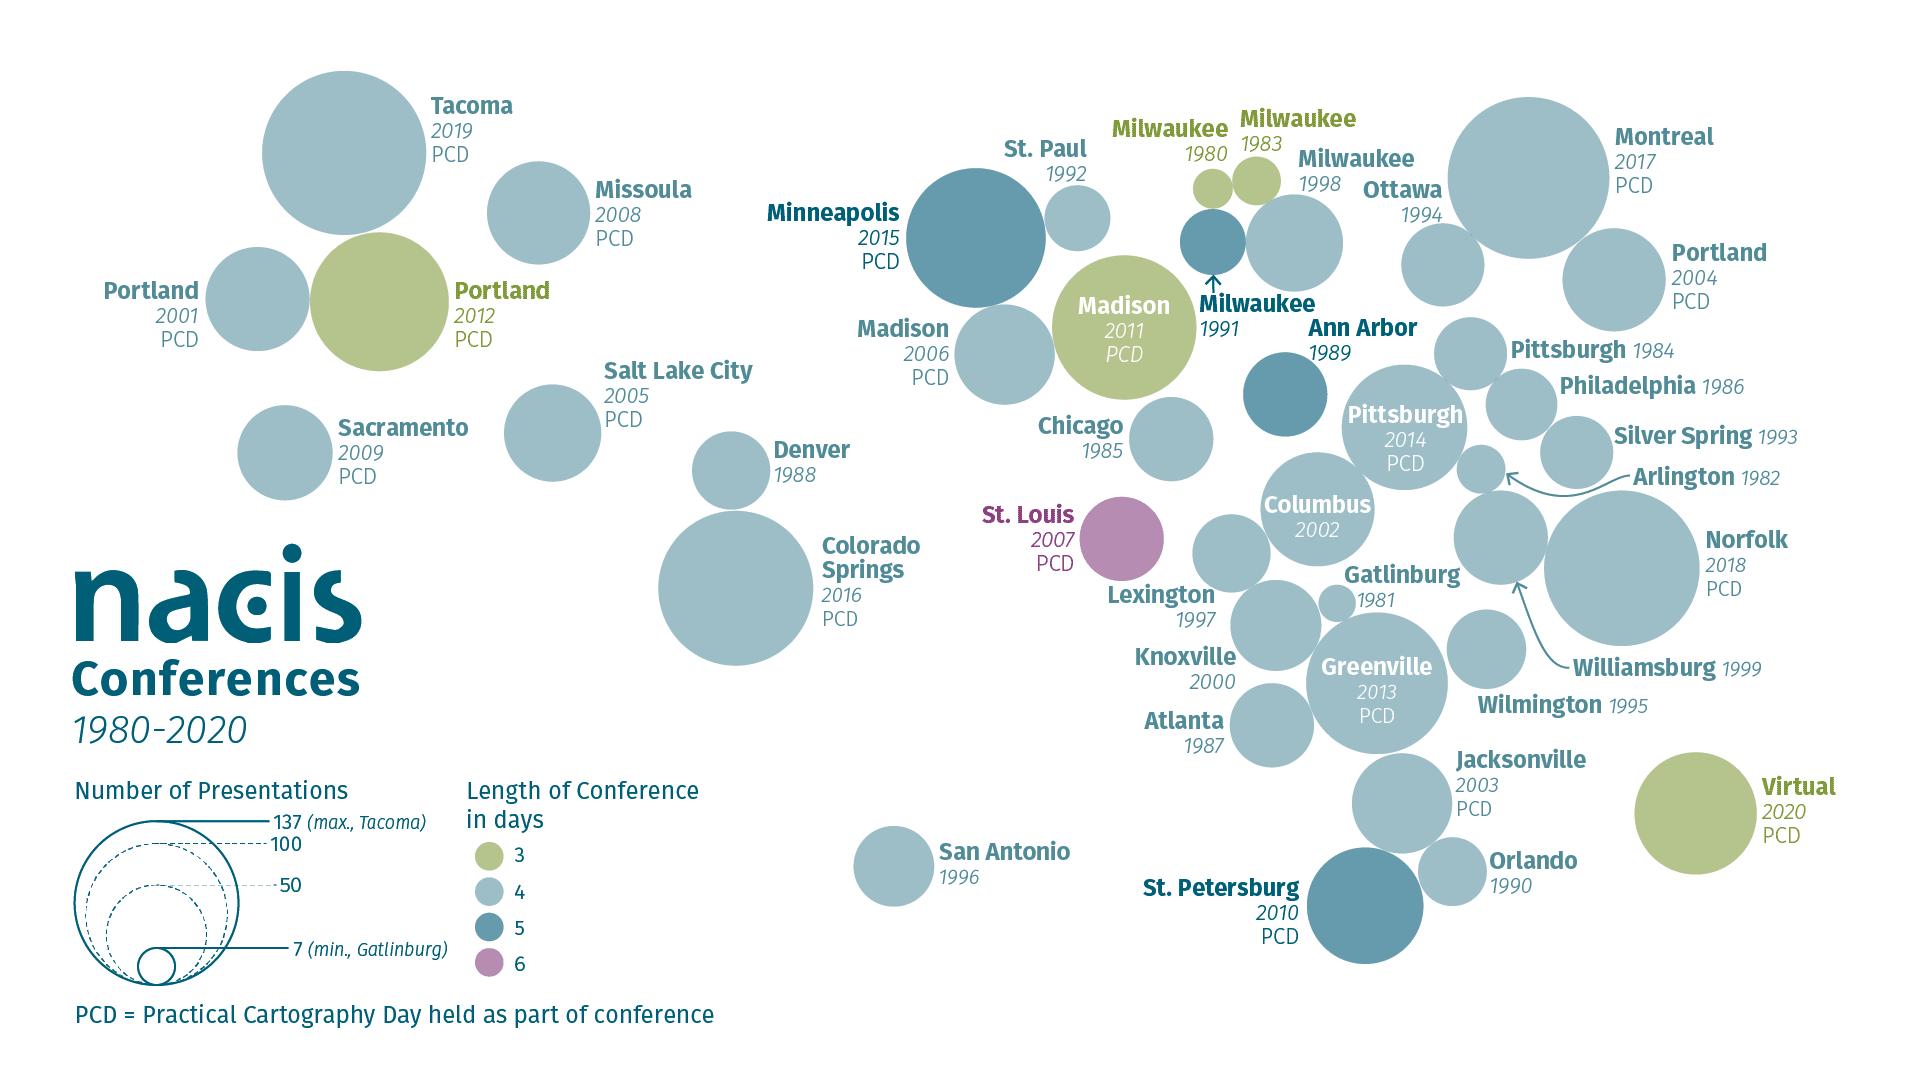 NACIS Conferences, 1980-2020